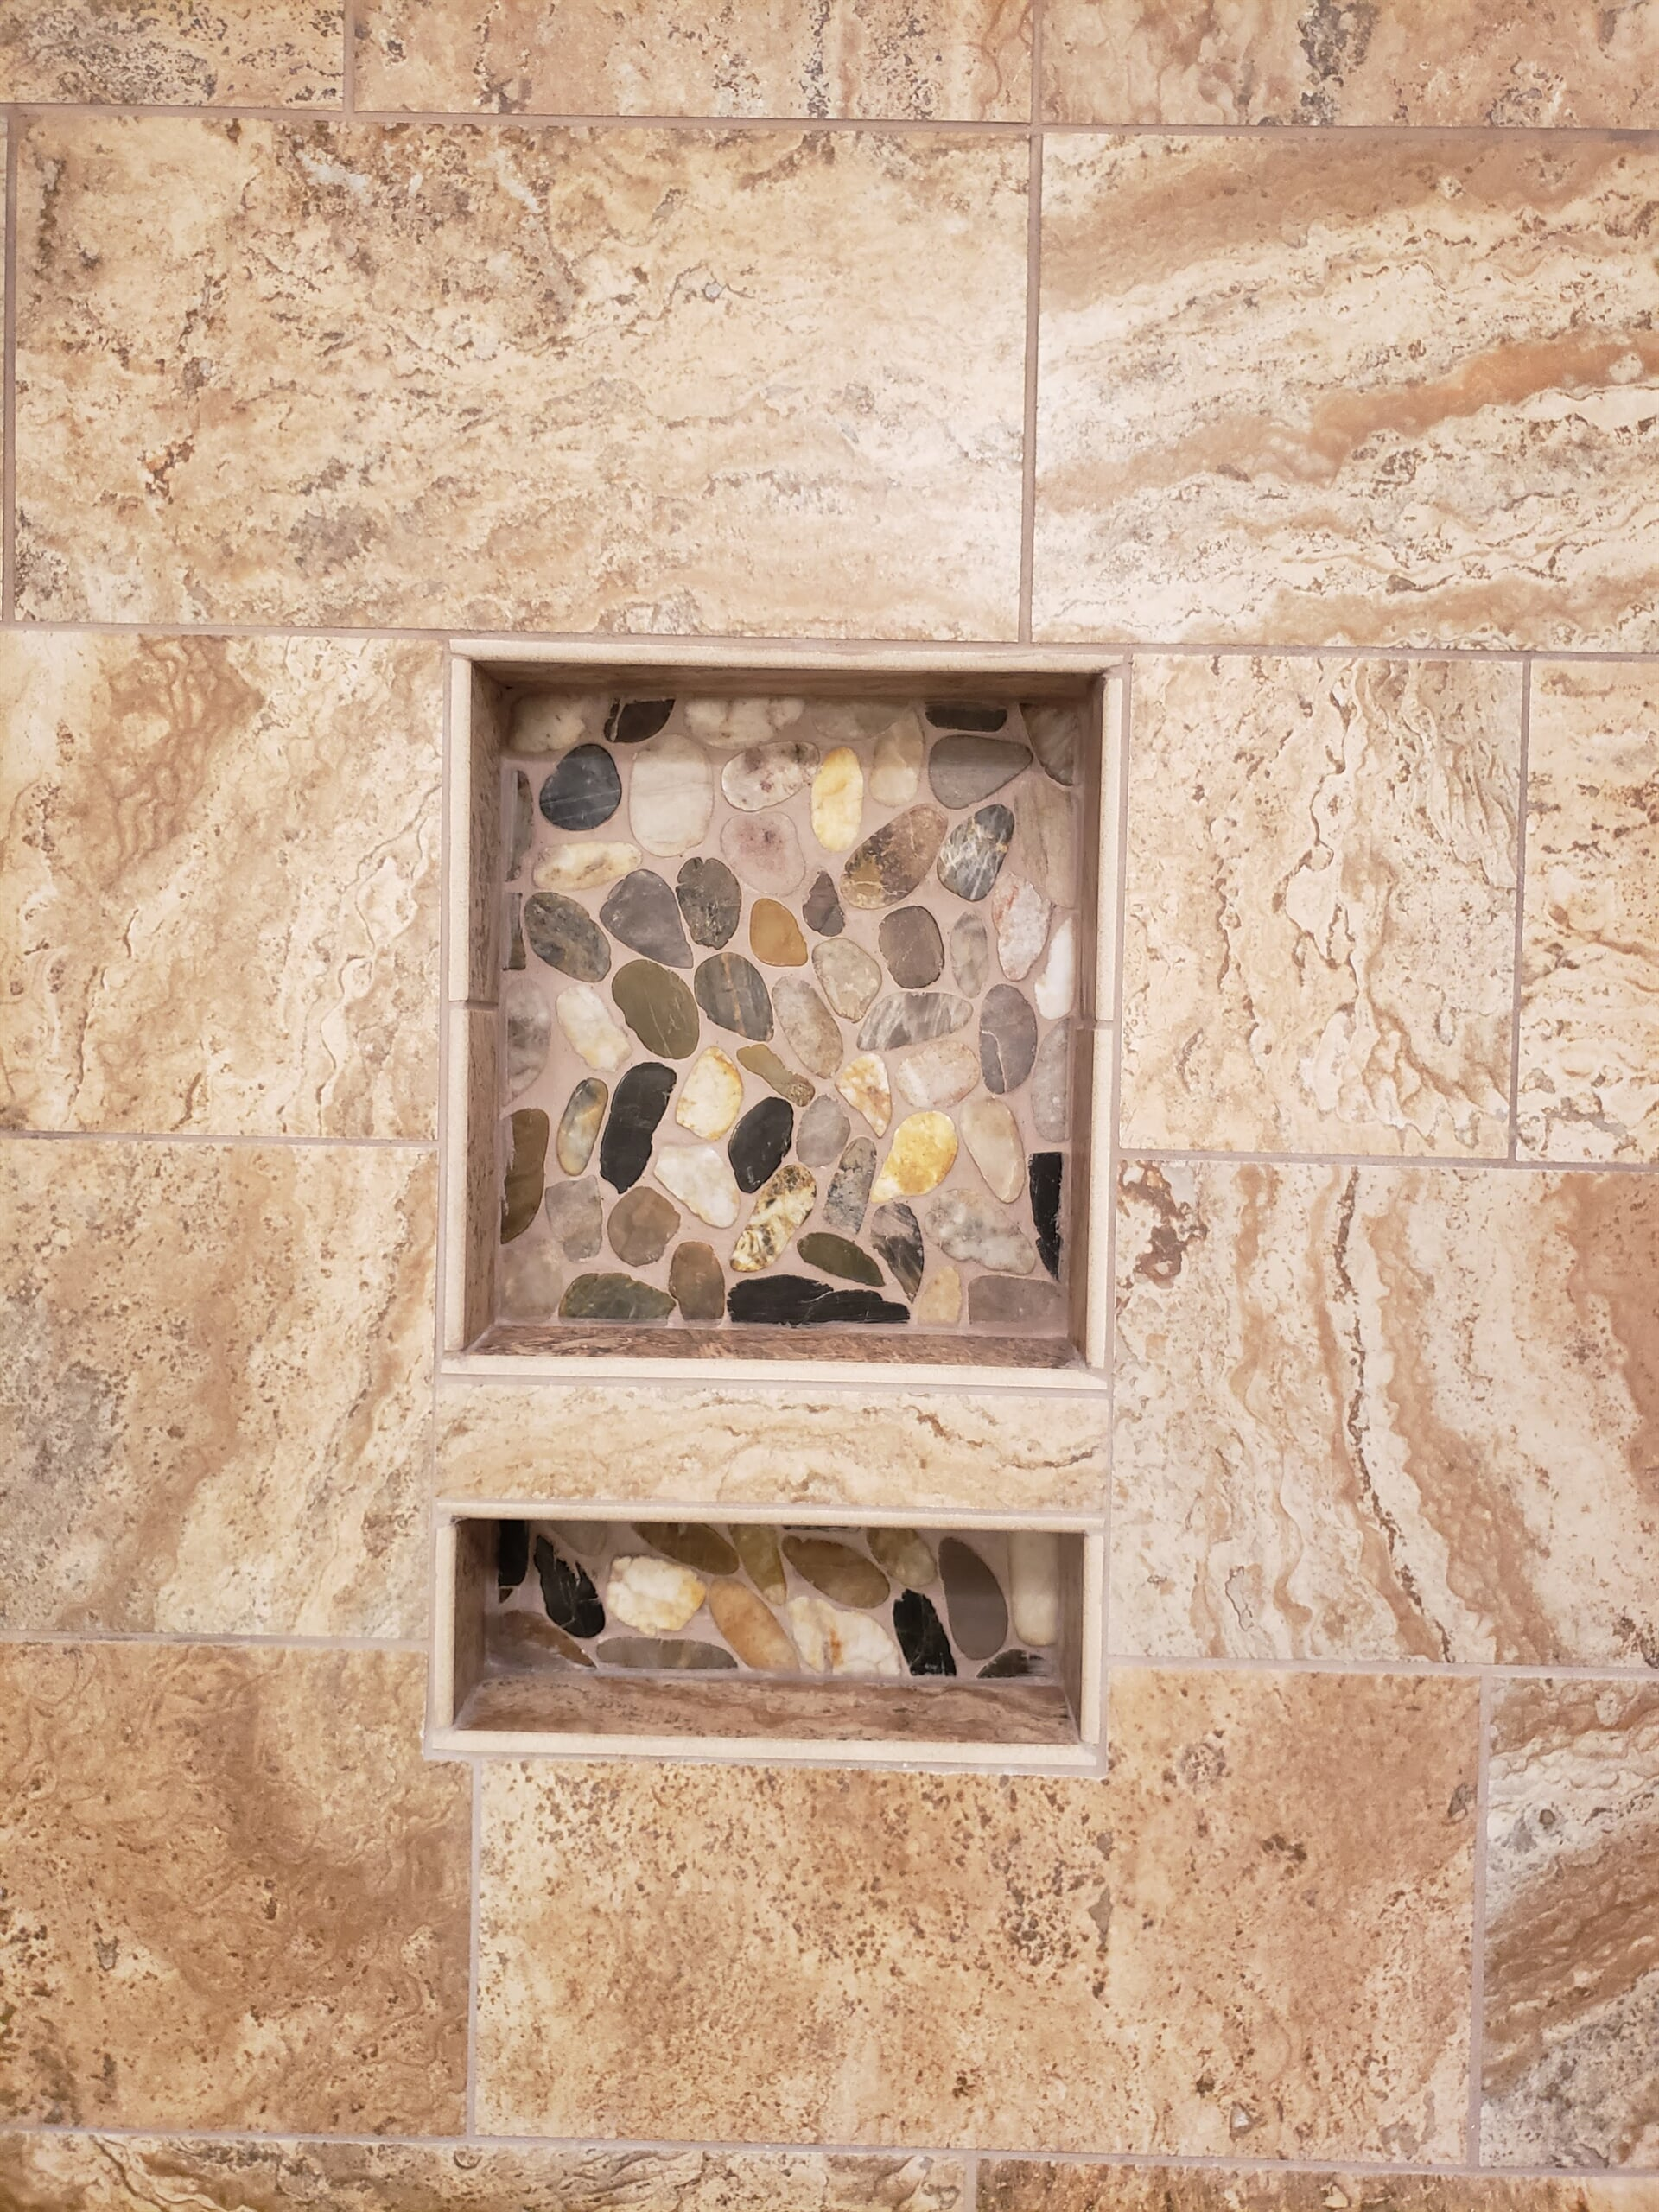 Custom recessed shower shelving in Lenoir, NC from McLean Floorcoverings